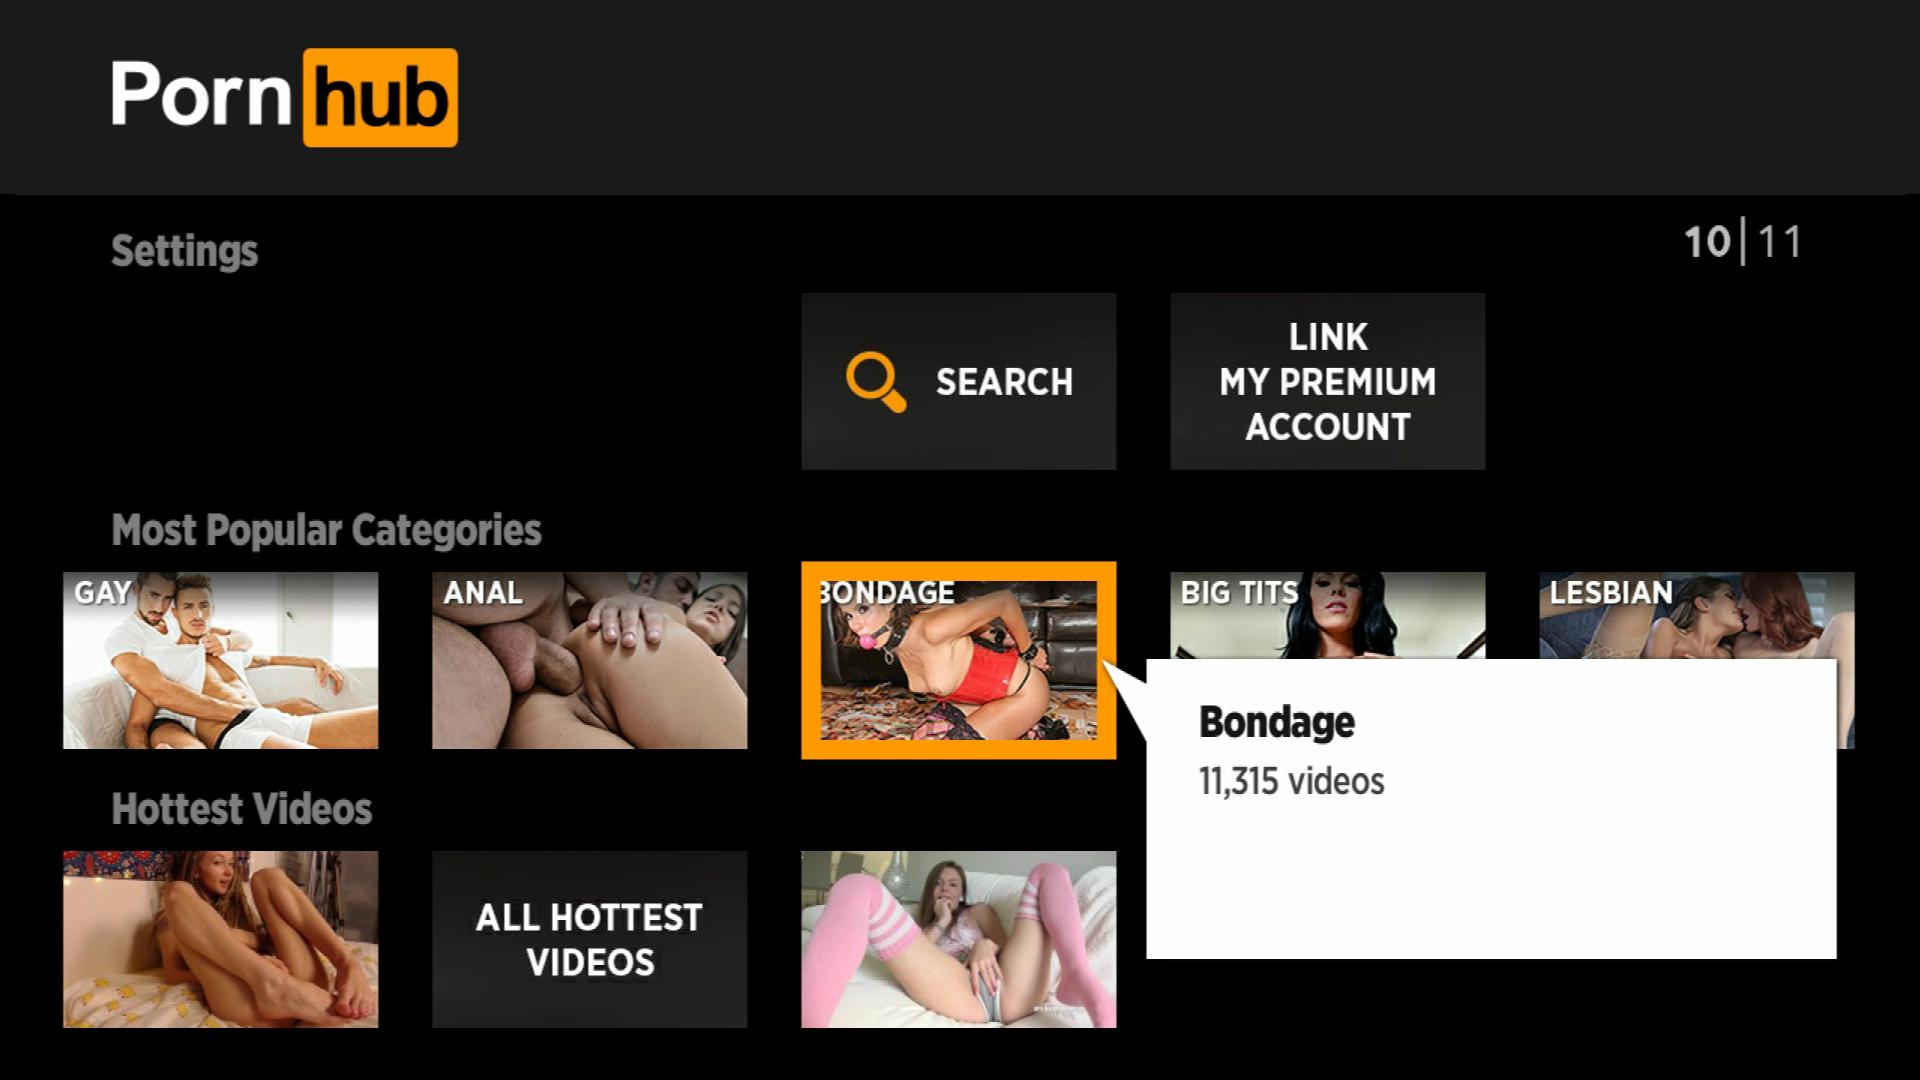 pornhub-roku-channel-screenshot-1